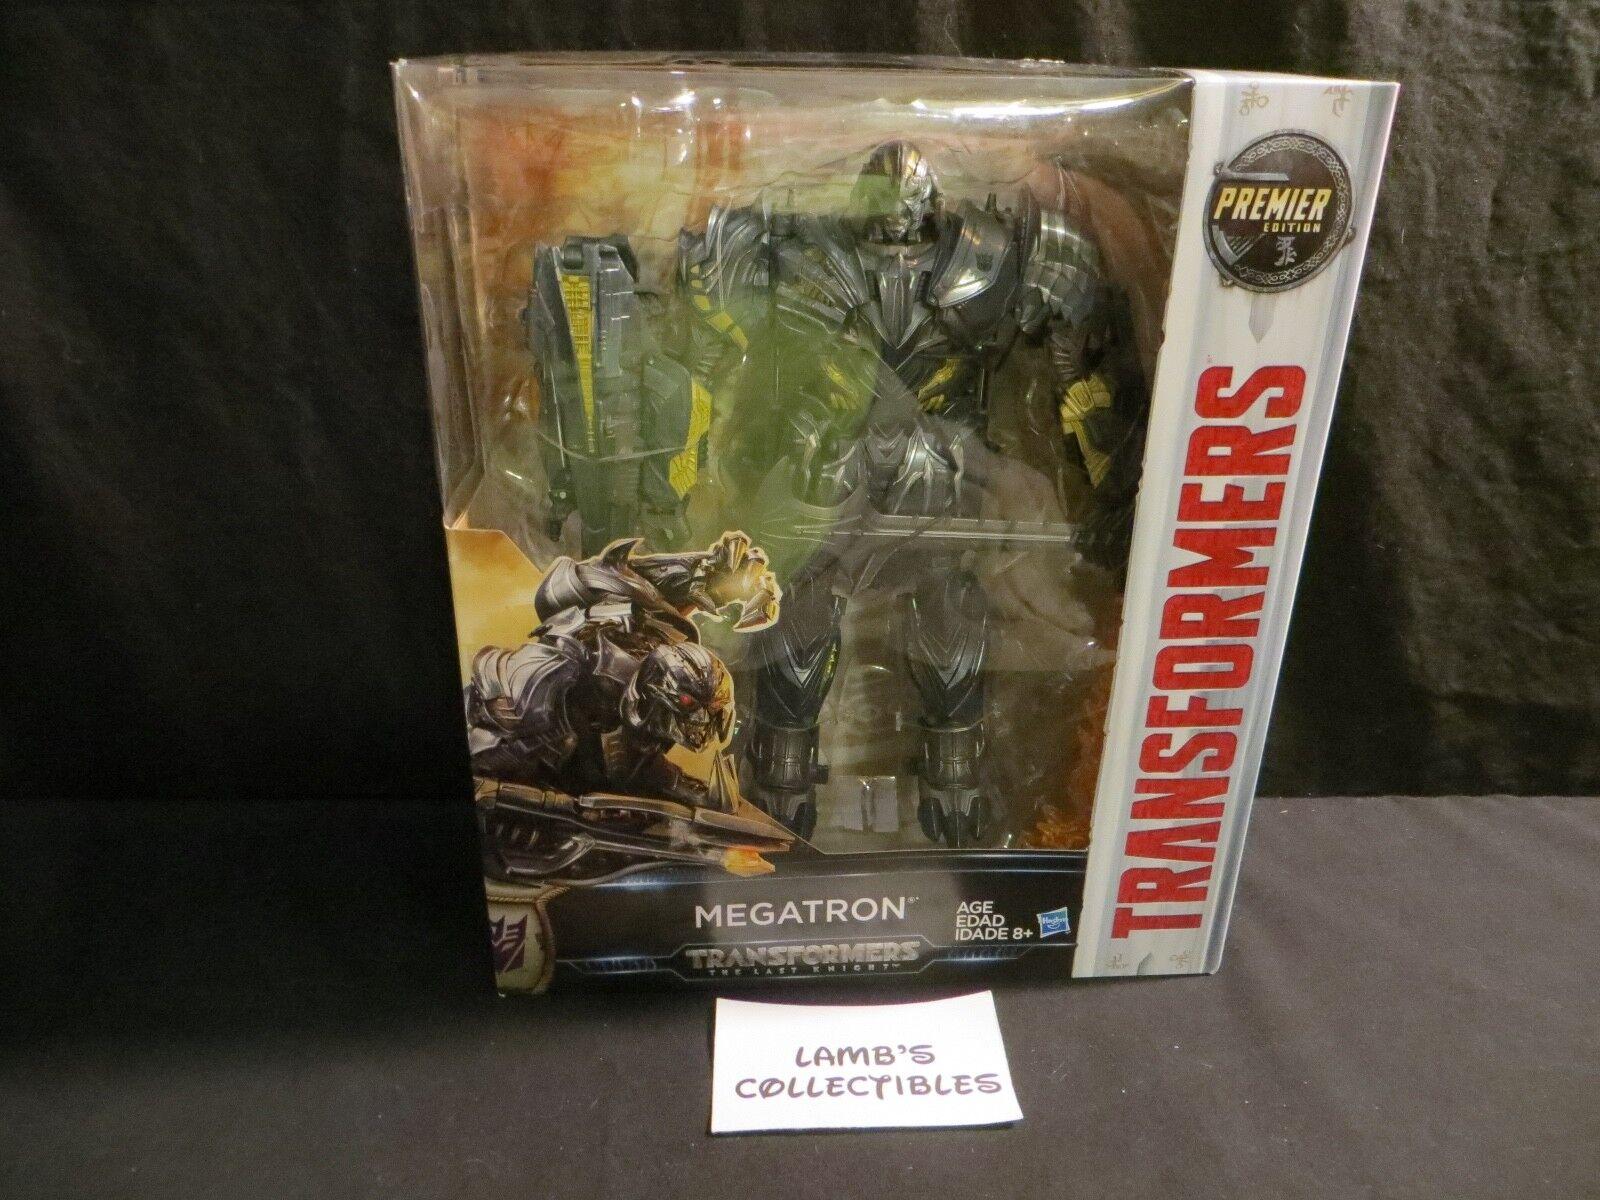 The Last Knight Premier Edition Leader Class 8  Megatron Transformers Hasbro